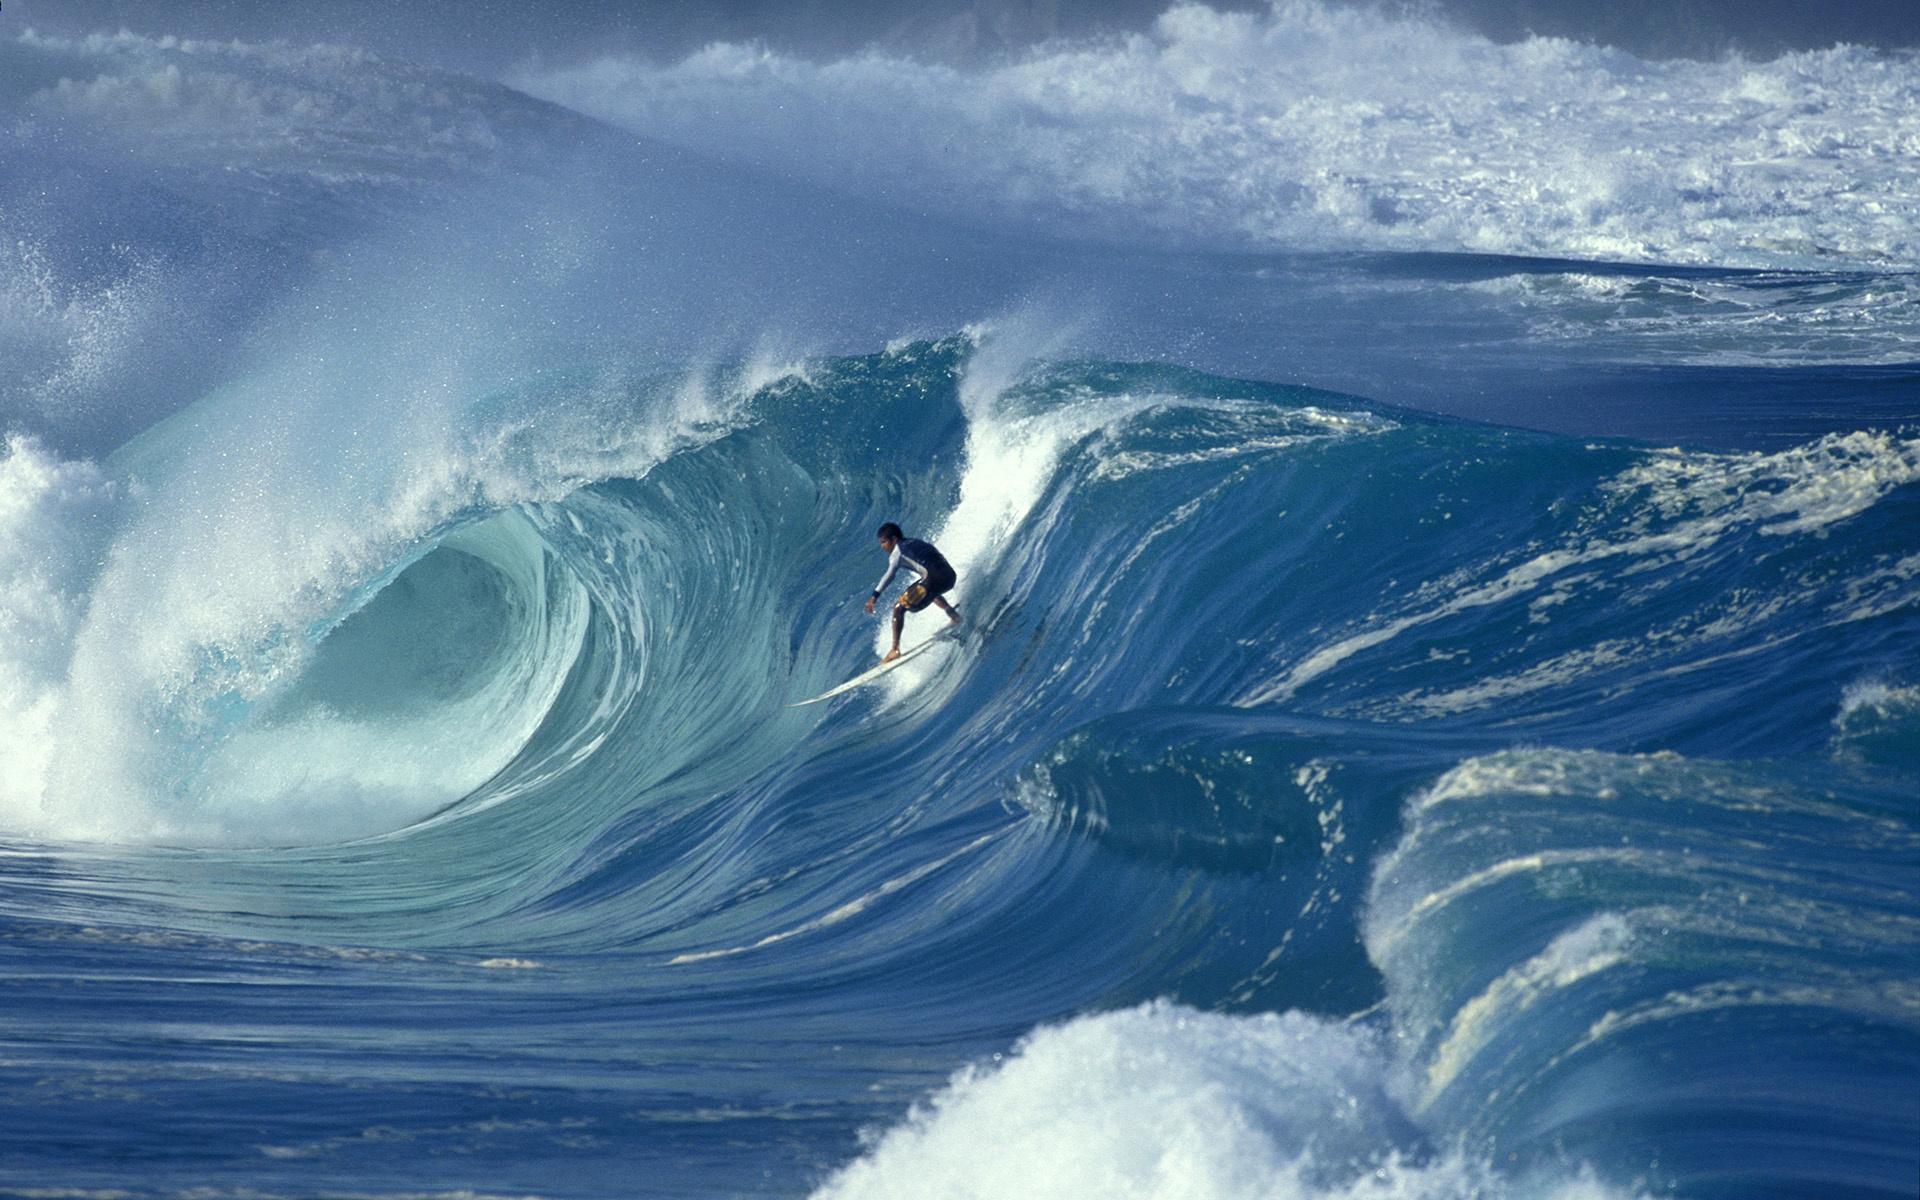 Wallpaper wave surfing big wave waimea shorebreak hawaii desktop 1920x1200